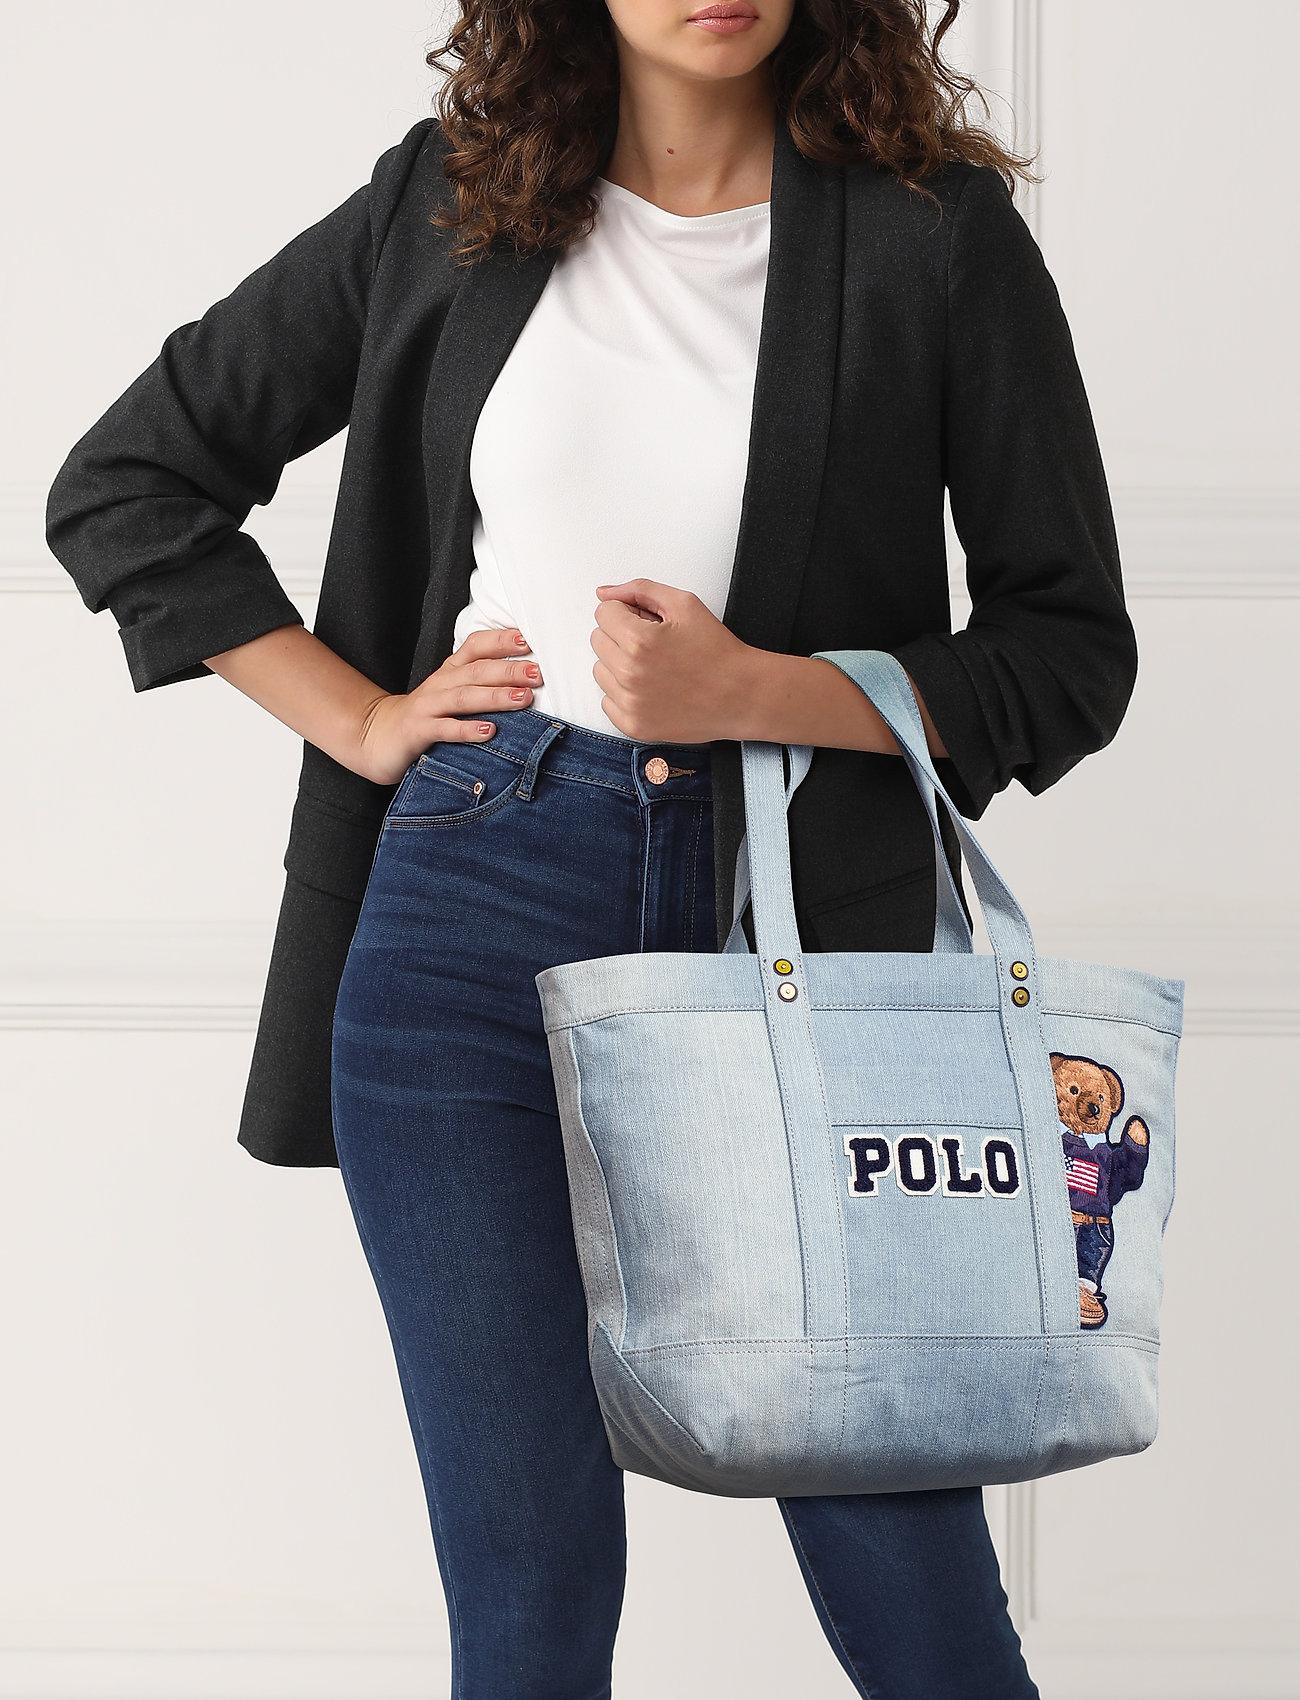 Polo Ralph Lauren Canvas Polo Bear Tote Bag - DENIM